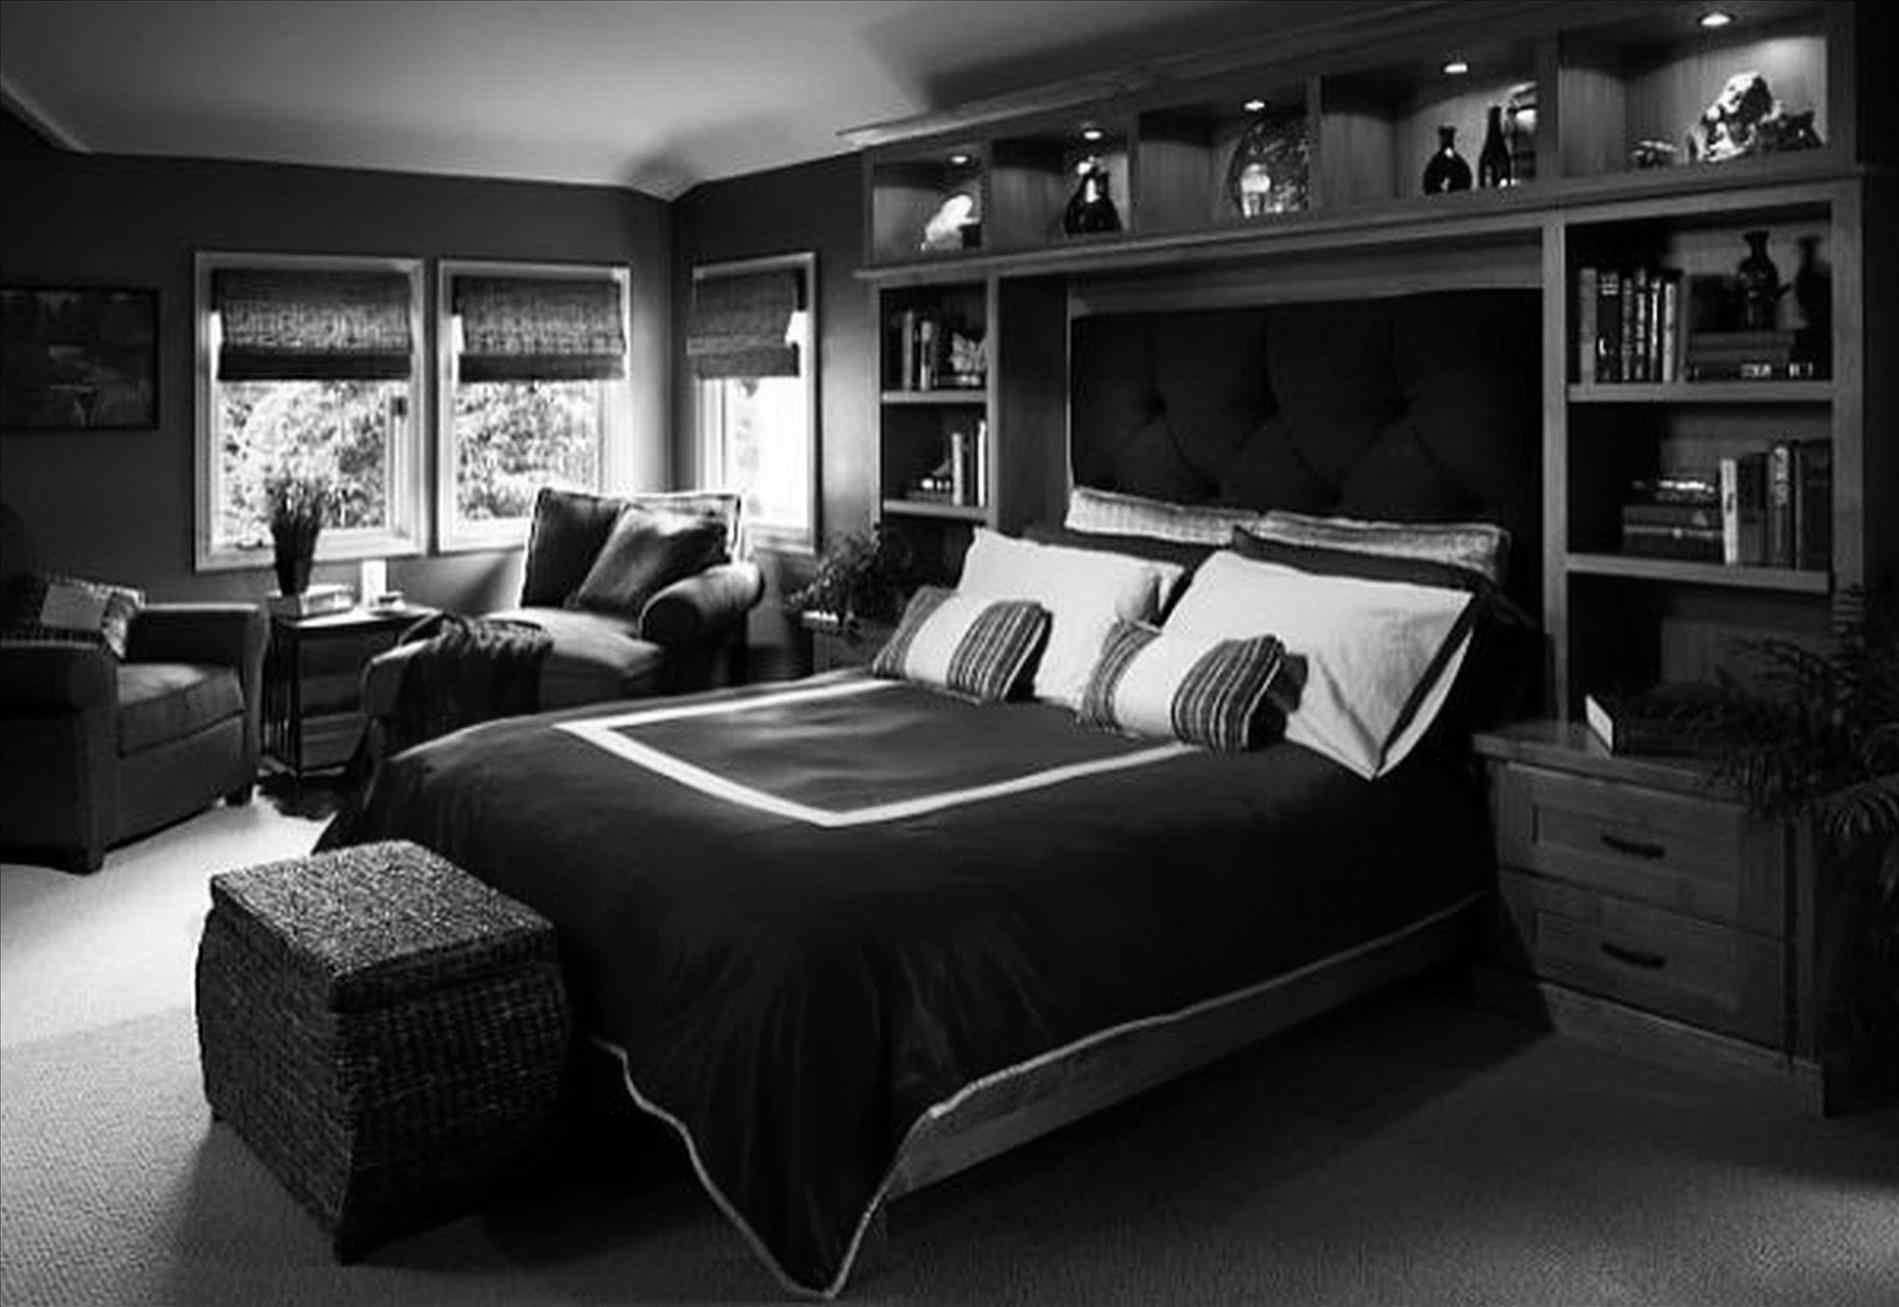 Cool Rugs For Men Mens Bedroom Red Bedroom Decor Elegant Bedroom Elegant black bedroom ideas